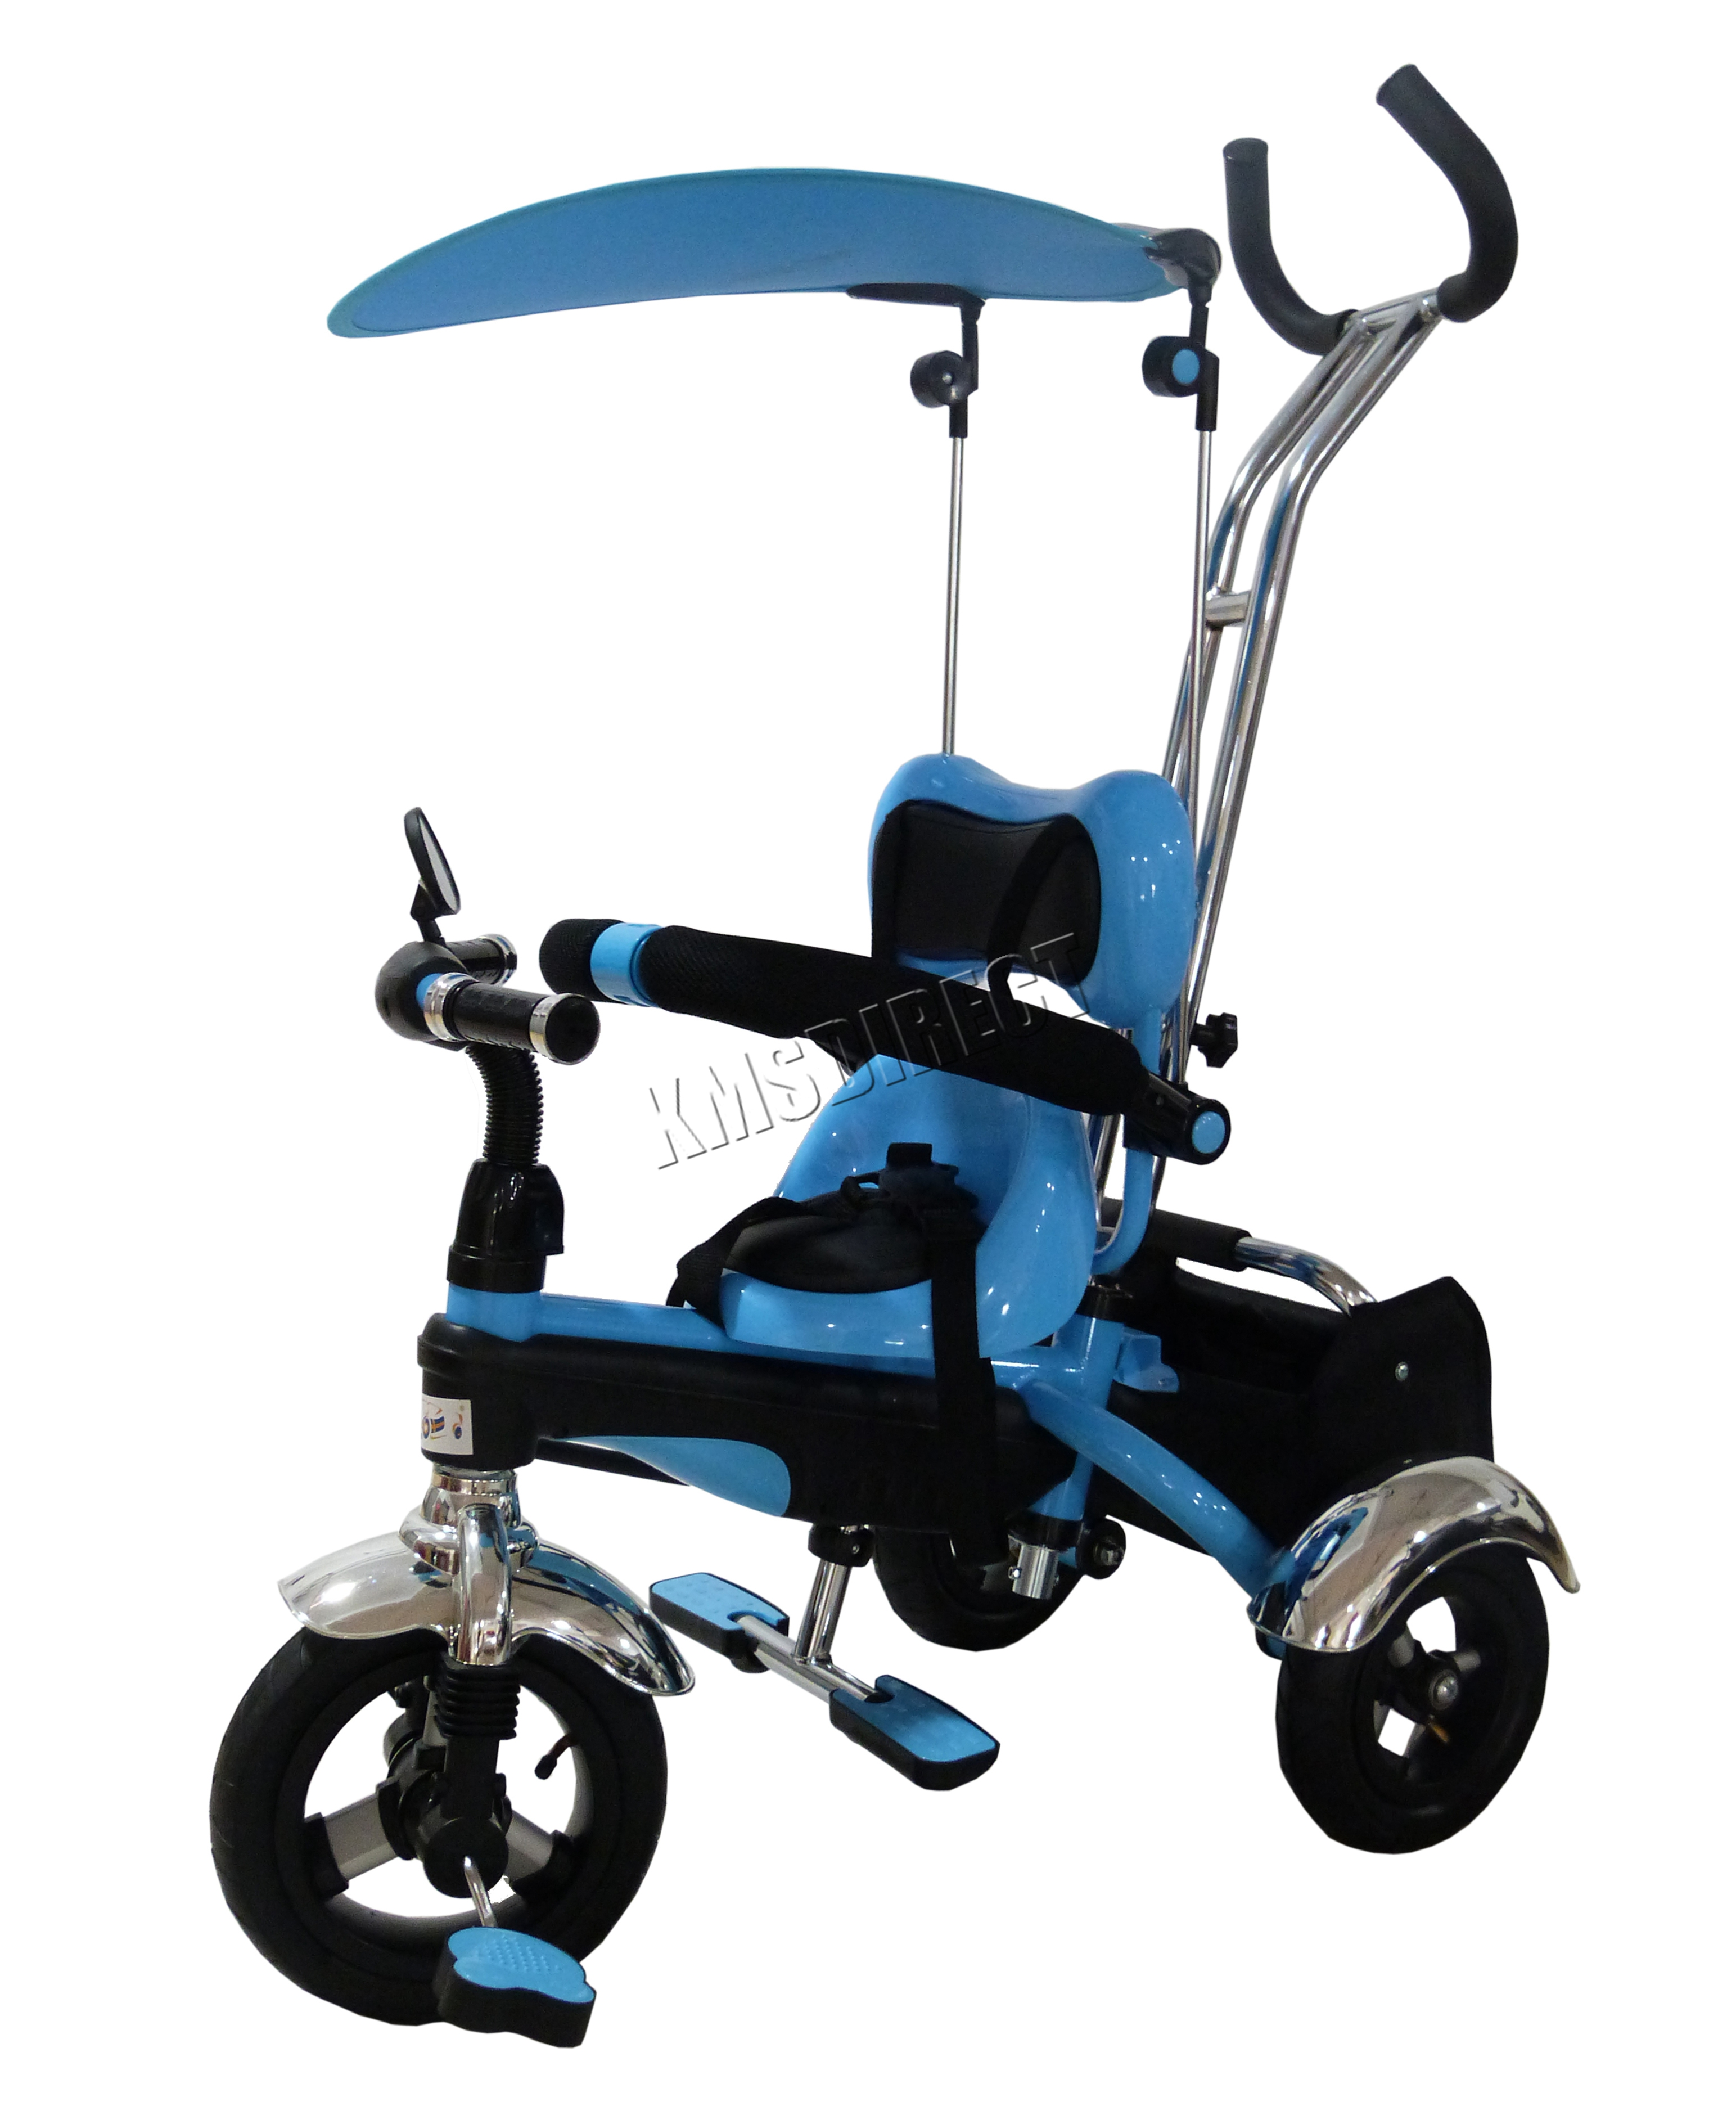 Foxhunter 4in1 Kids Children Trike Tricycle 3 Wheel Ride